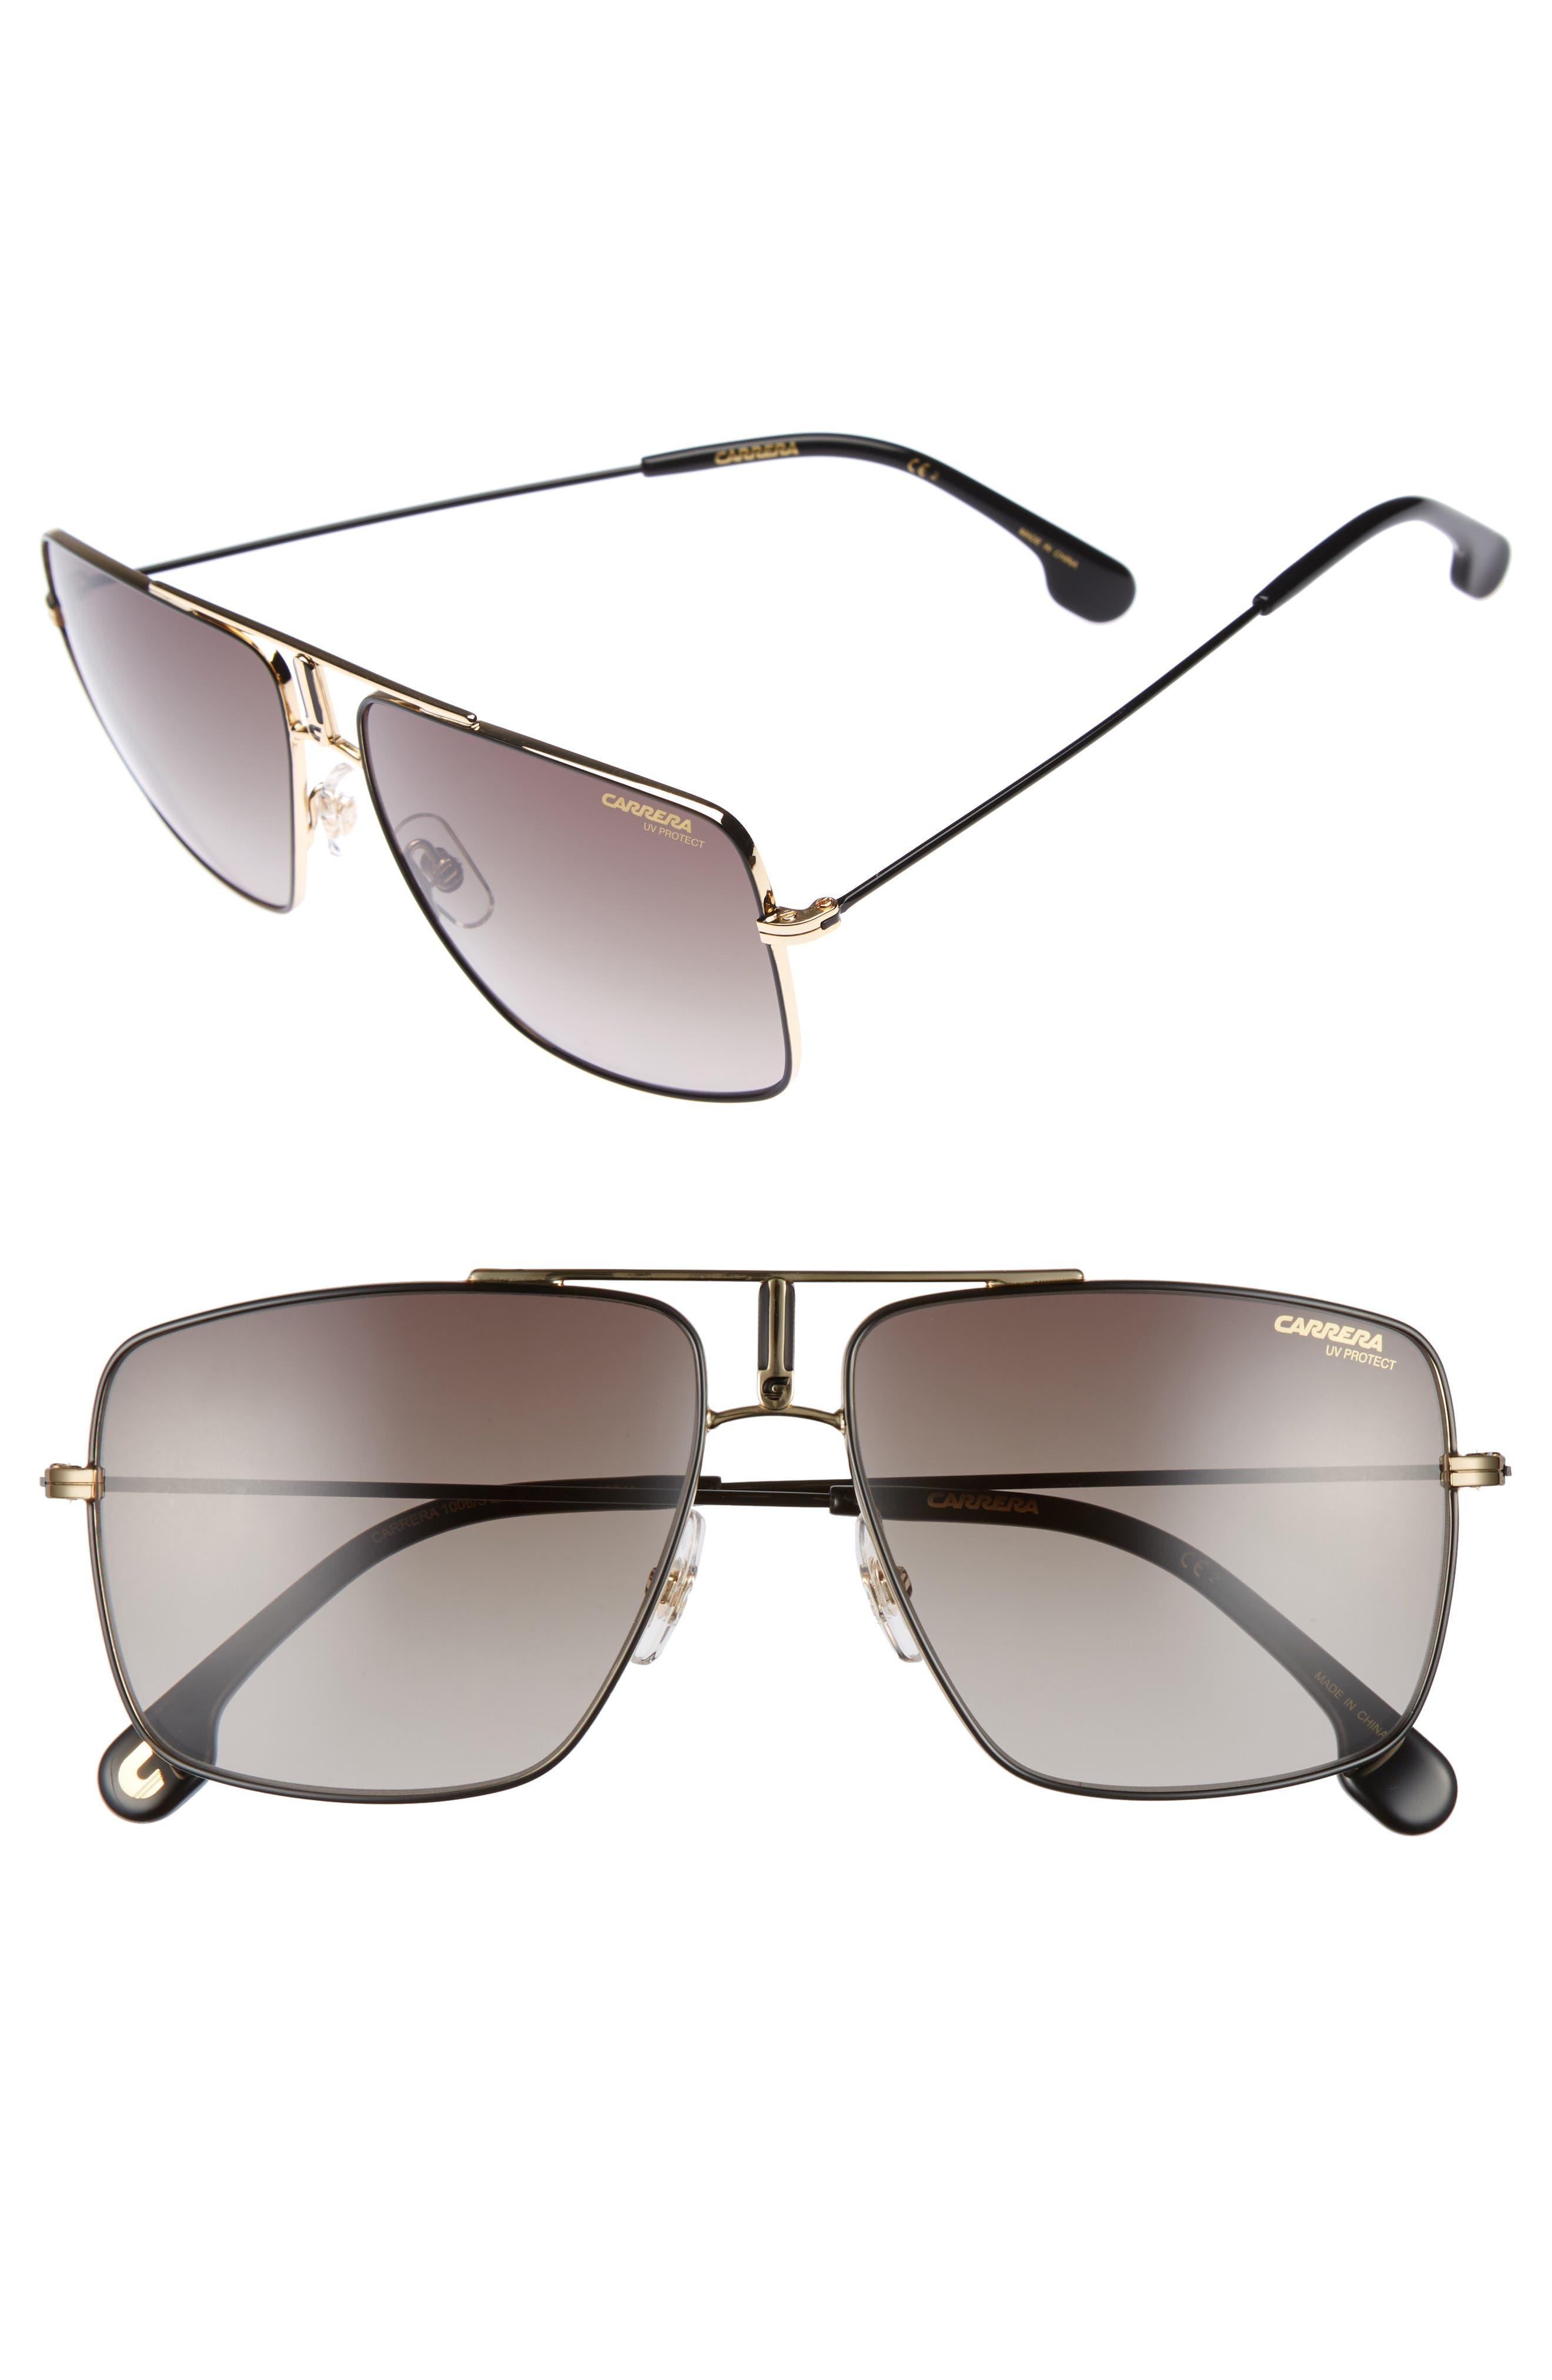 Carrera 60mm Aviator Sunglasses,                         Main,                         color, Black Gold